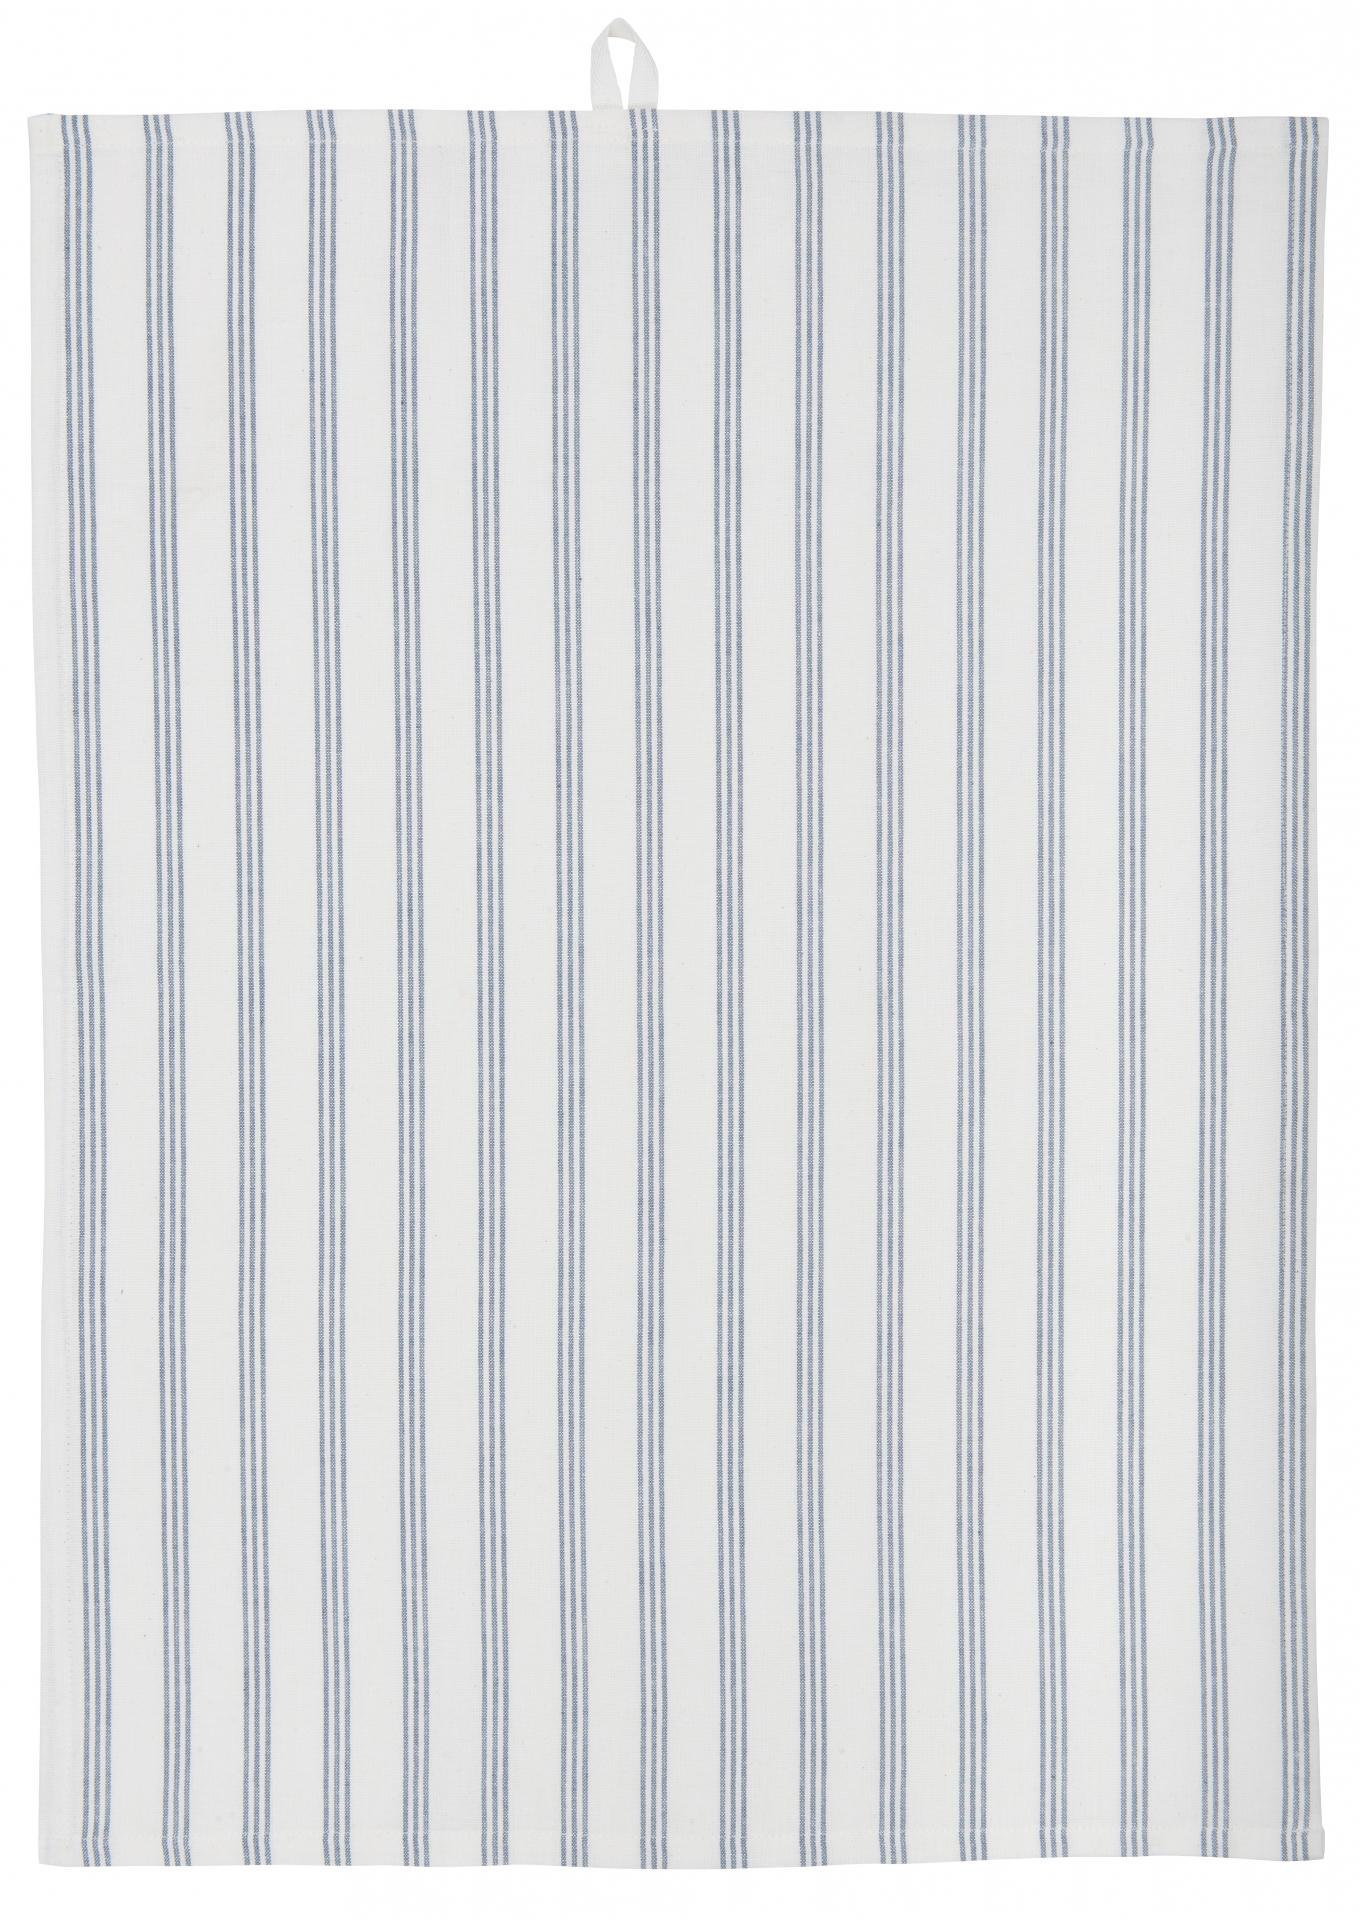 IB LAURSEN Utěrka Stripes Blue